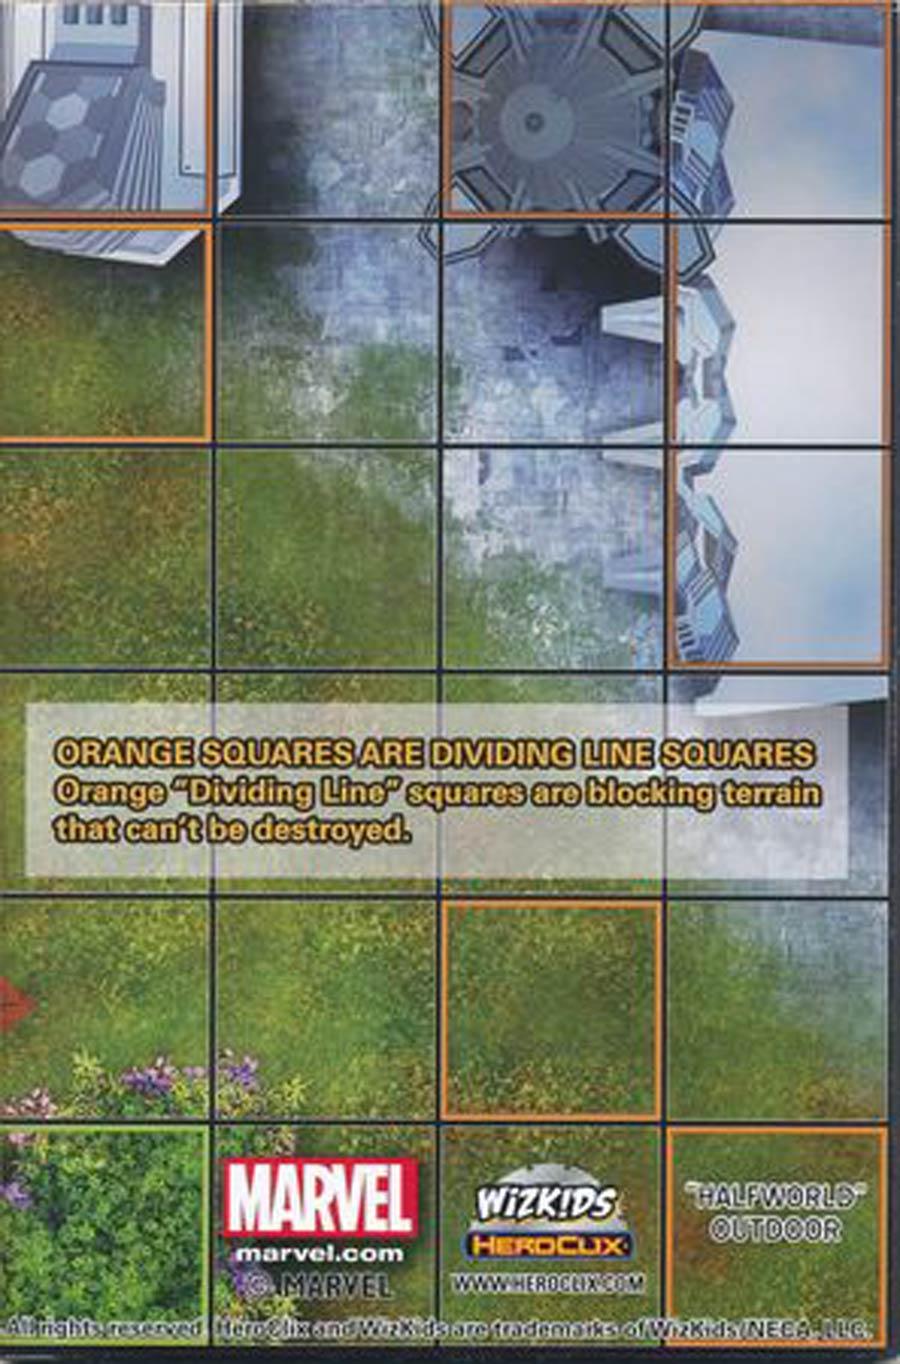 Marvel HeroClix Earth X Halfworld Outdoor / Galador Promenade Outdoor Double Sided Map